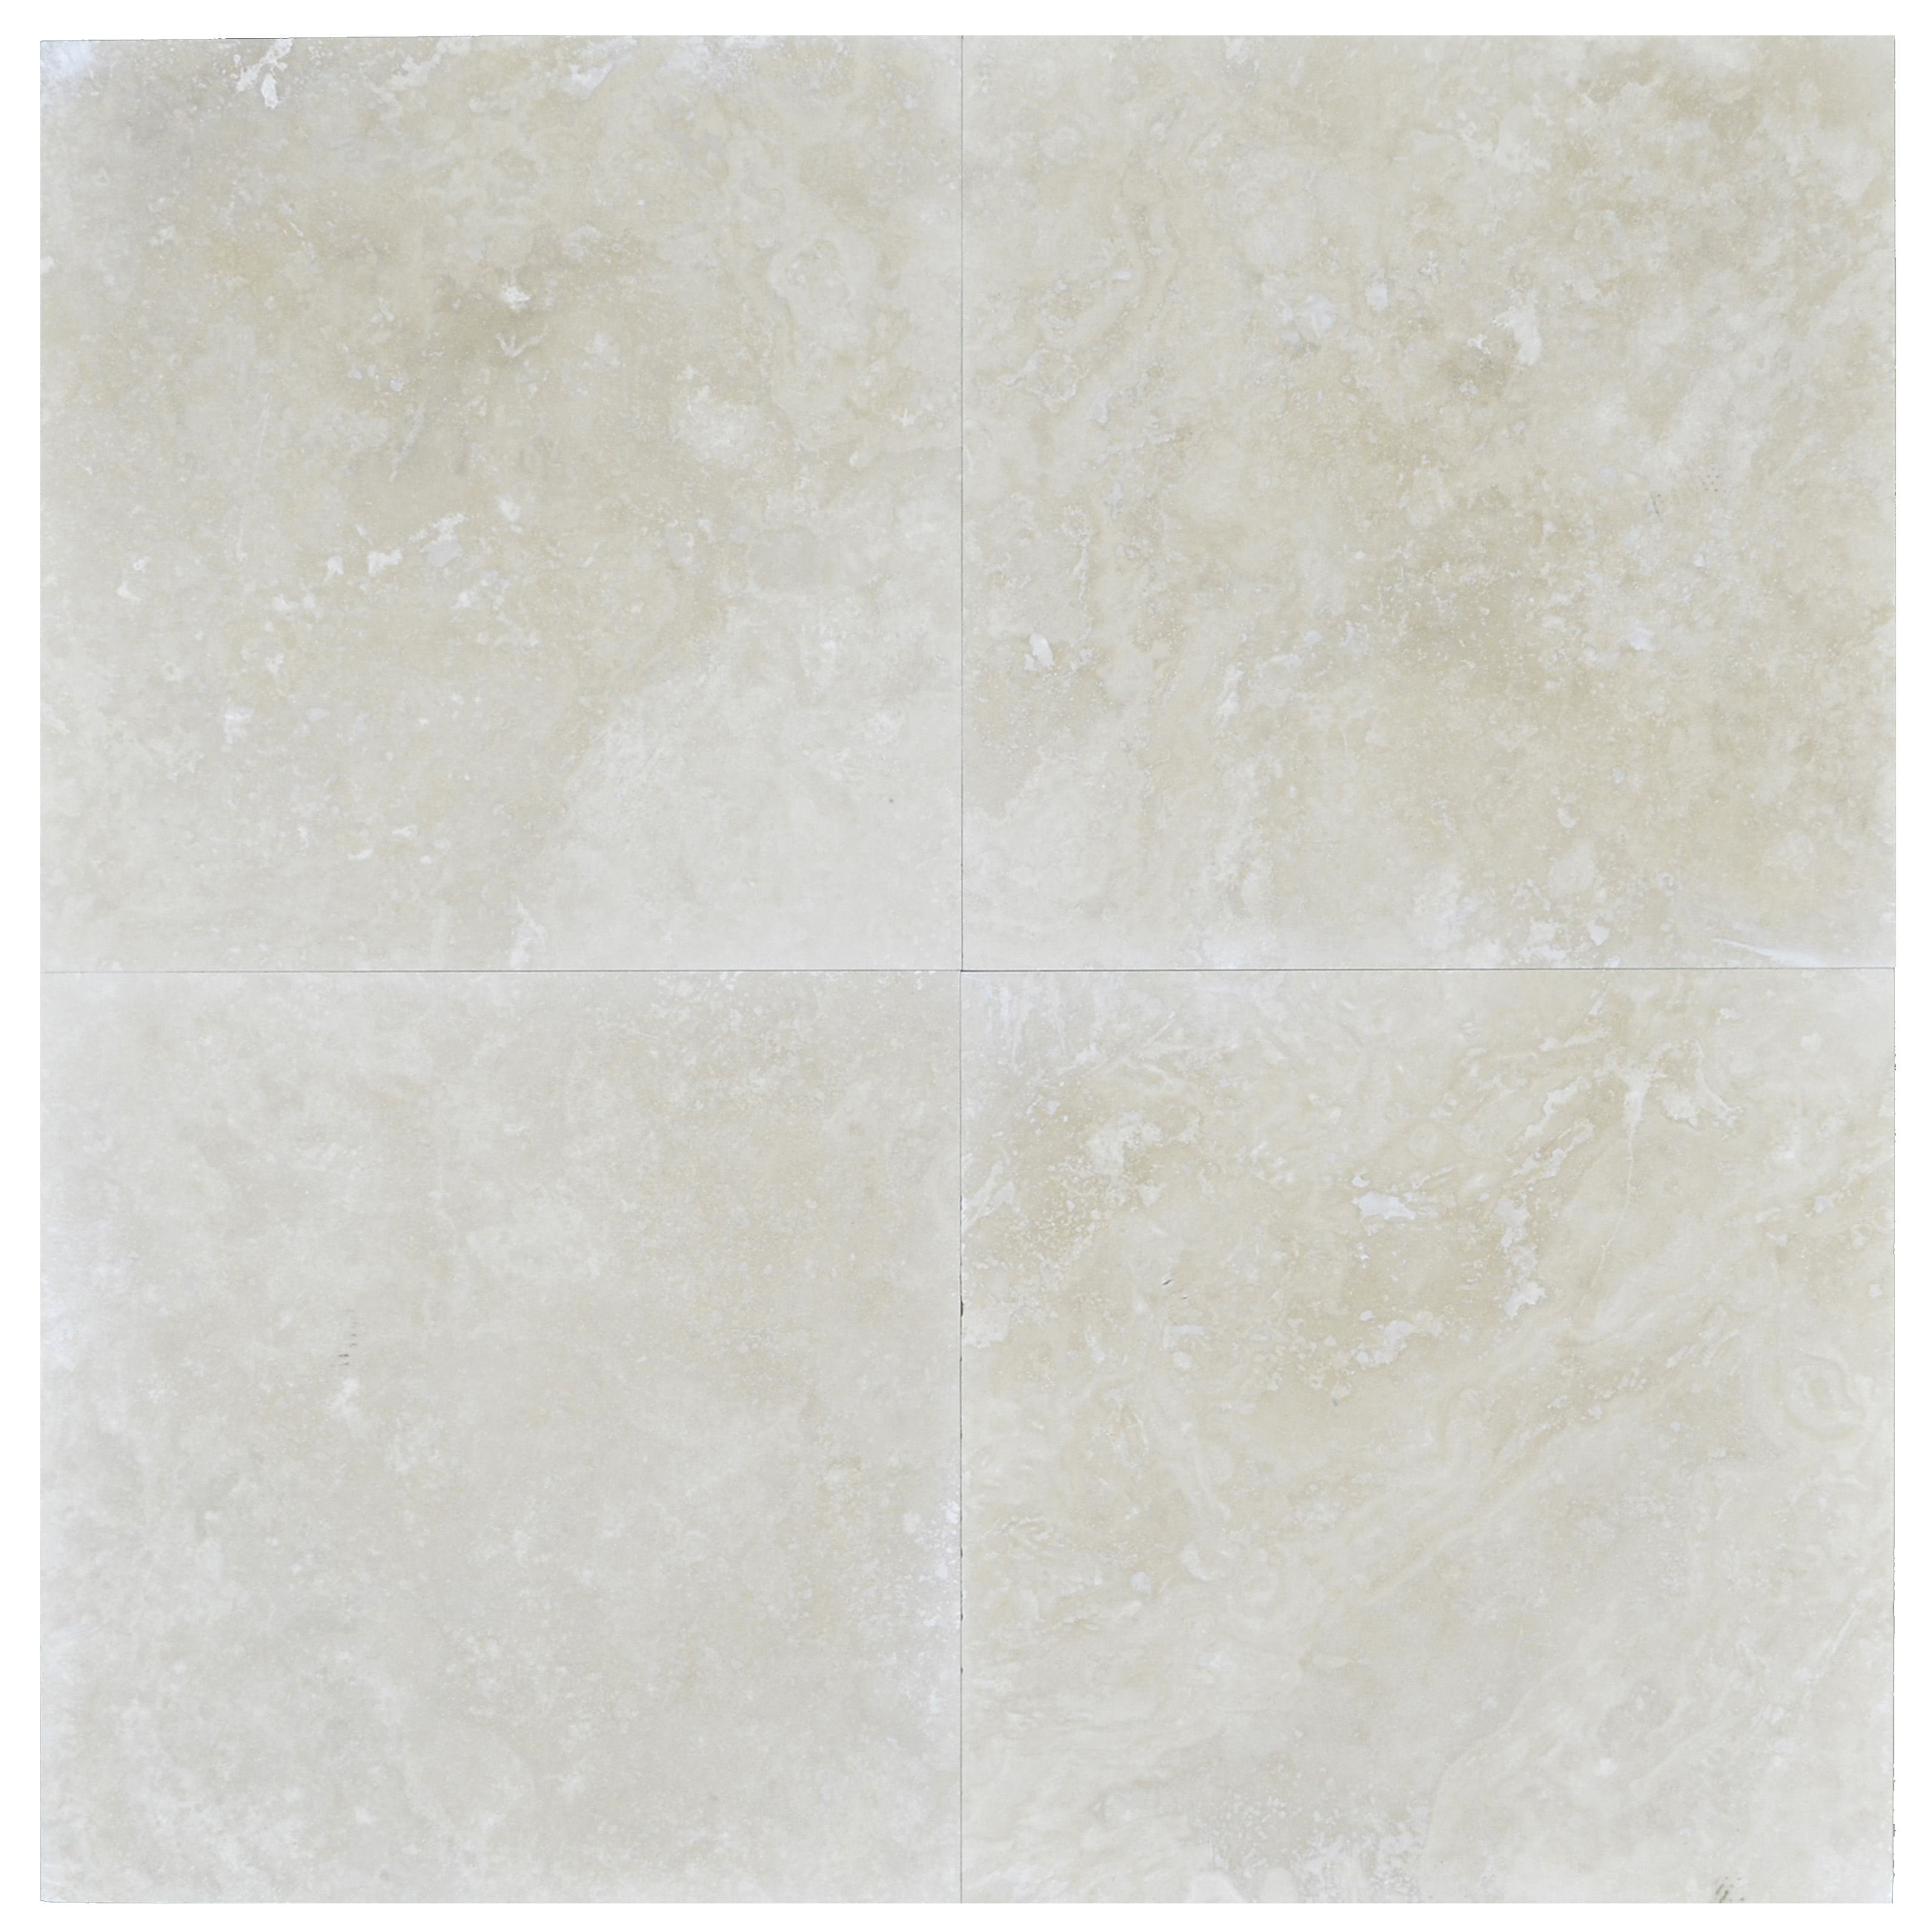 FRIG LIGHT HONED AND FILLED 24x24 TRAVERTINE TILE Travertine tiles sale-Atlantic Stone Source